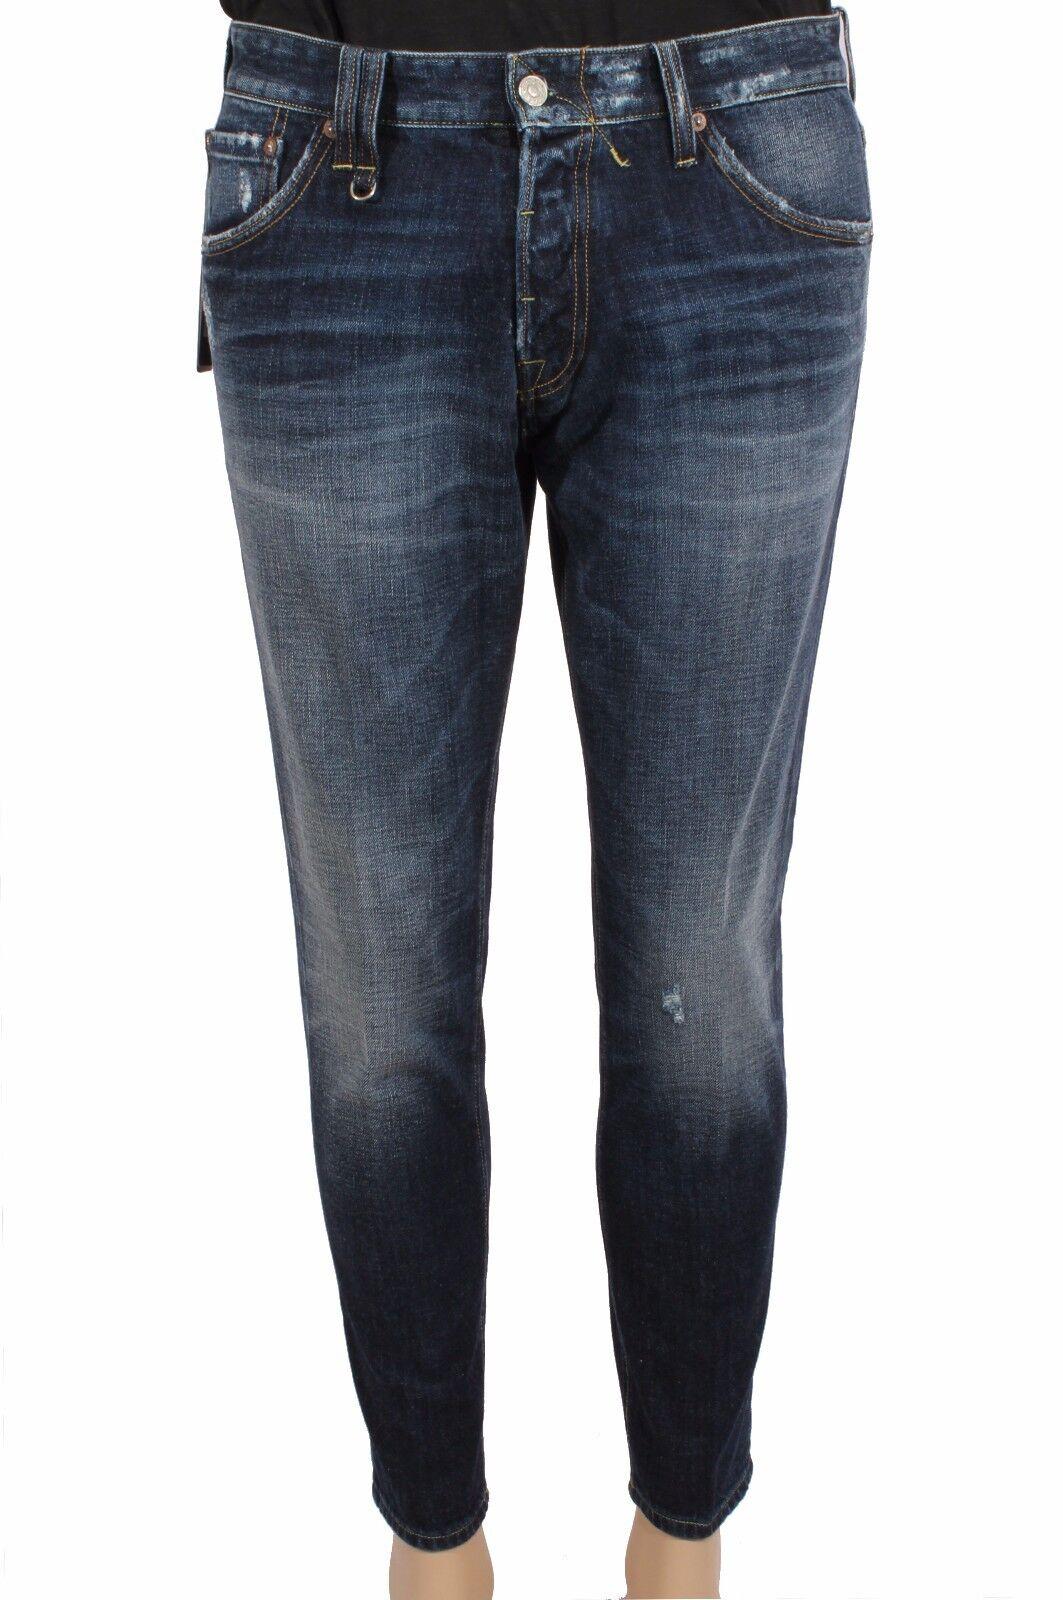 Men's Jeans CYCLE MPT170 SH D1079 L2946 Denim Cotton 11OZ Real Indigo